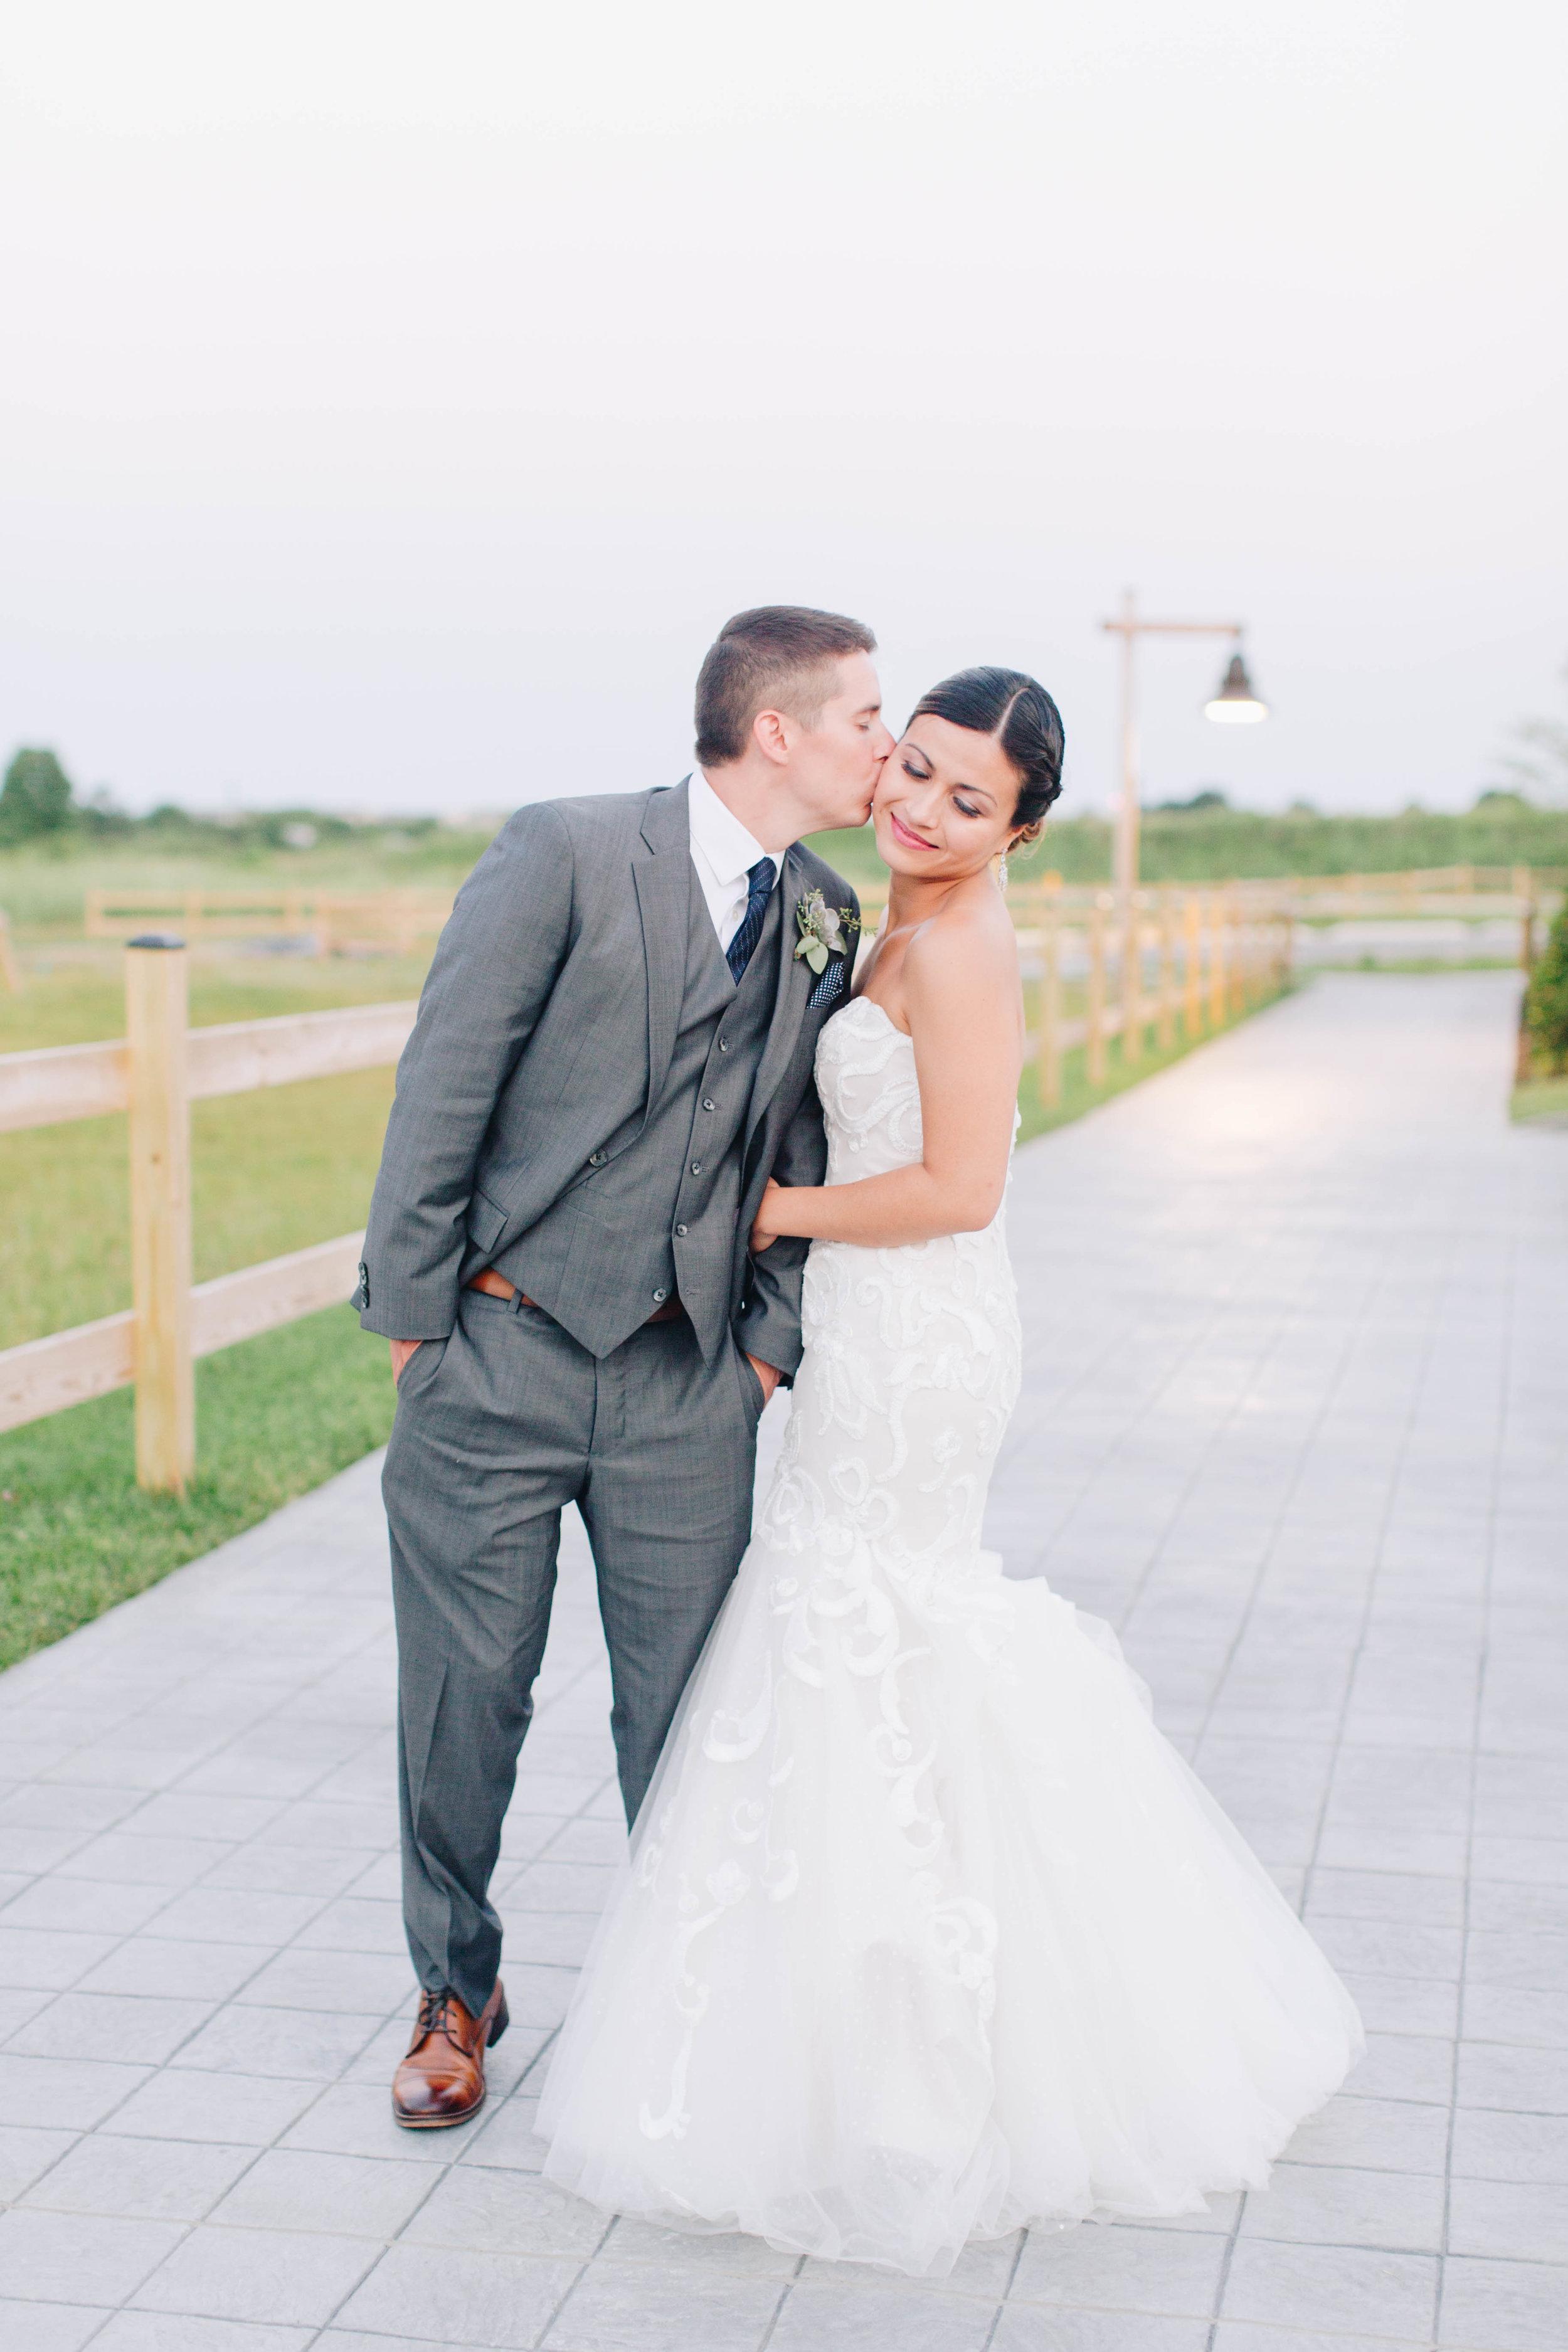 weddinghighlights-29.jpg